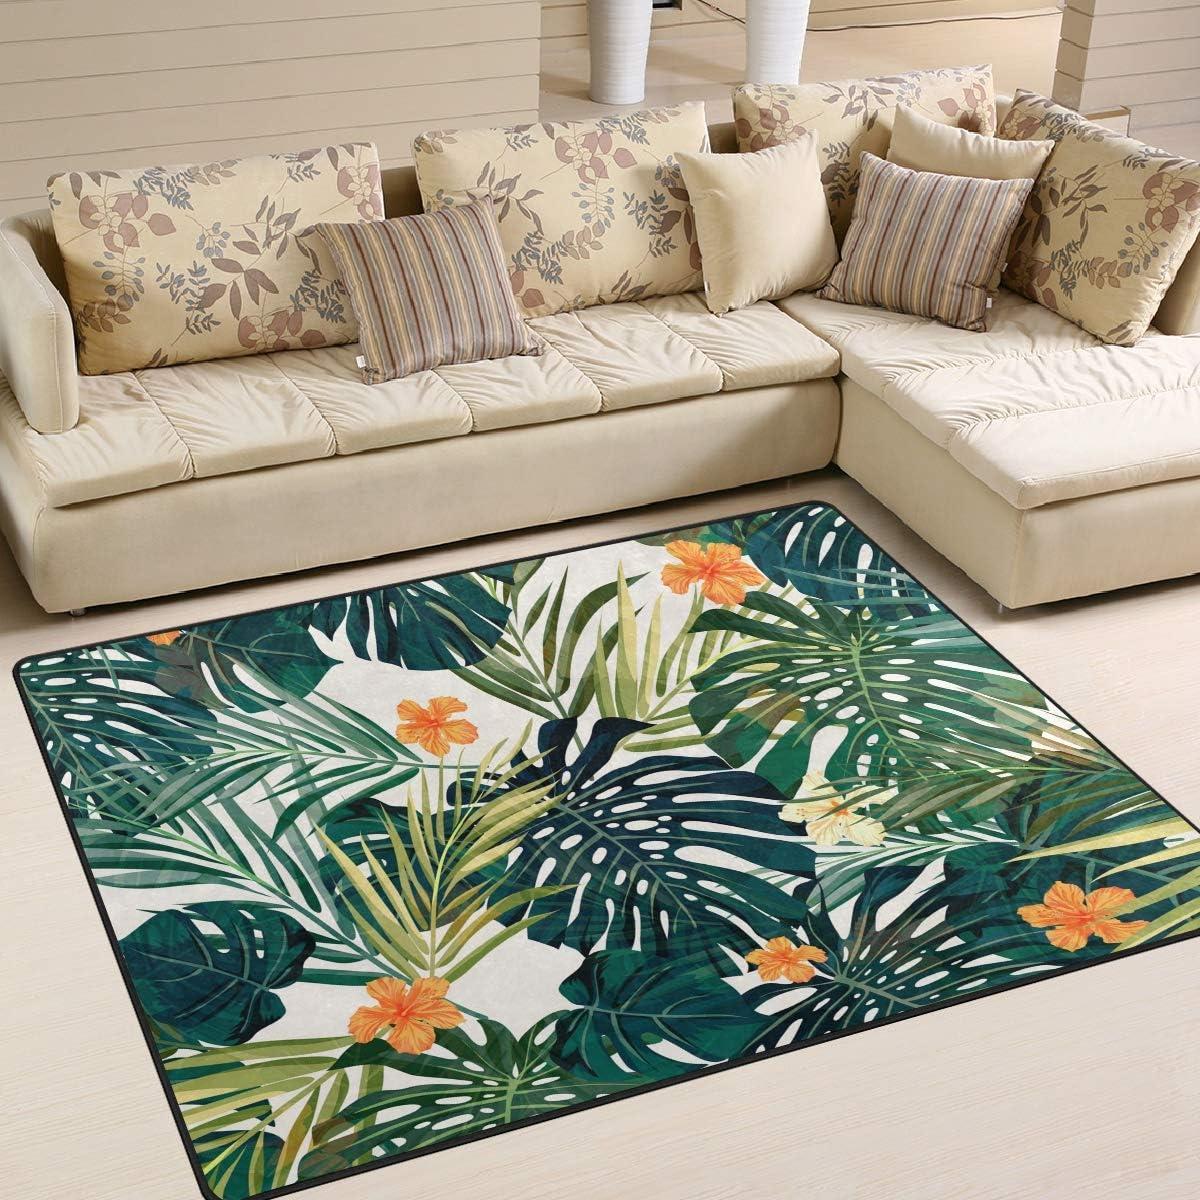 Modern Area Rugs 5x7 Washable - Palm Tree Green LeavesSoft Aera Rug Anti-Skid Nursery Rug Carpet Floor Mat Home Decor Living Room and Outdoor